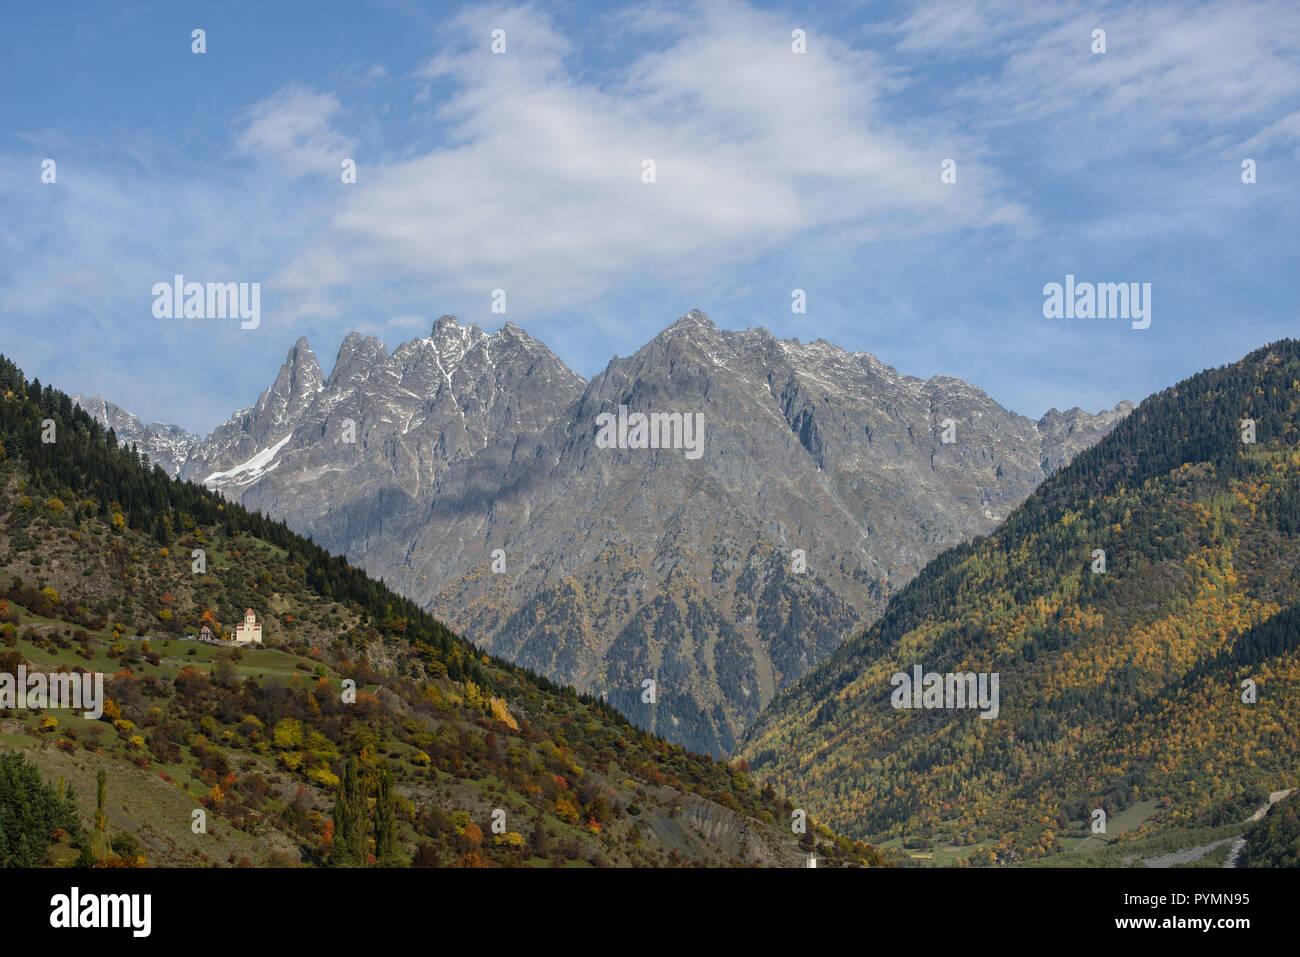 Caucasus mountain autumn landscape from the Svaneti region in Georgia Stock Photo